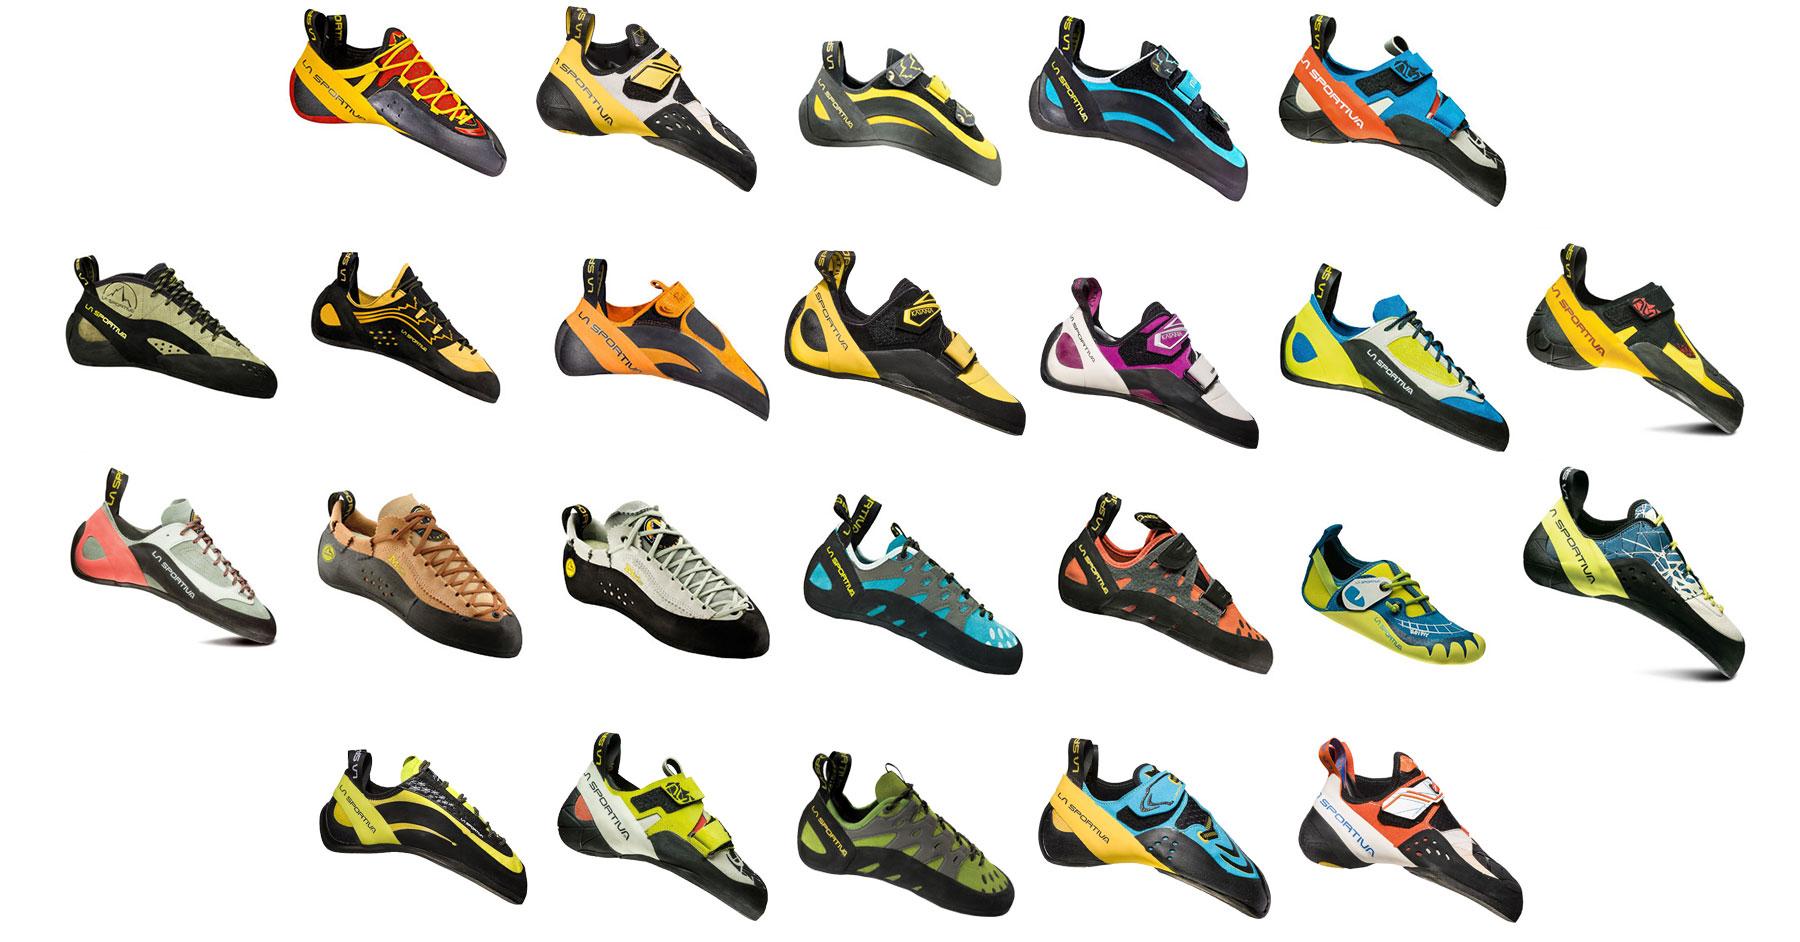 La Sportiva 2019 climbing shoe range